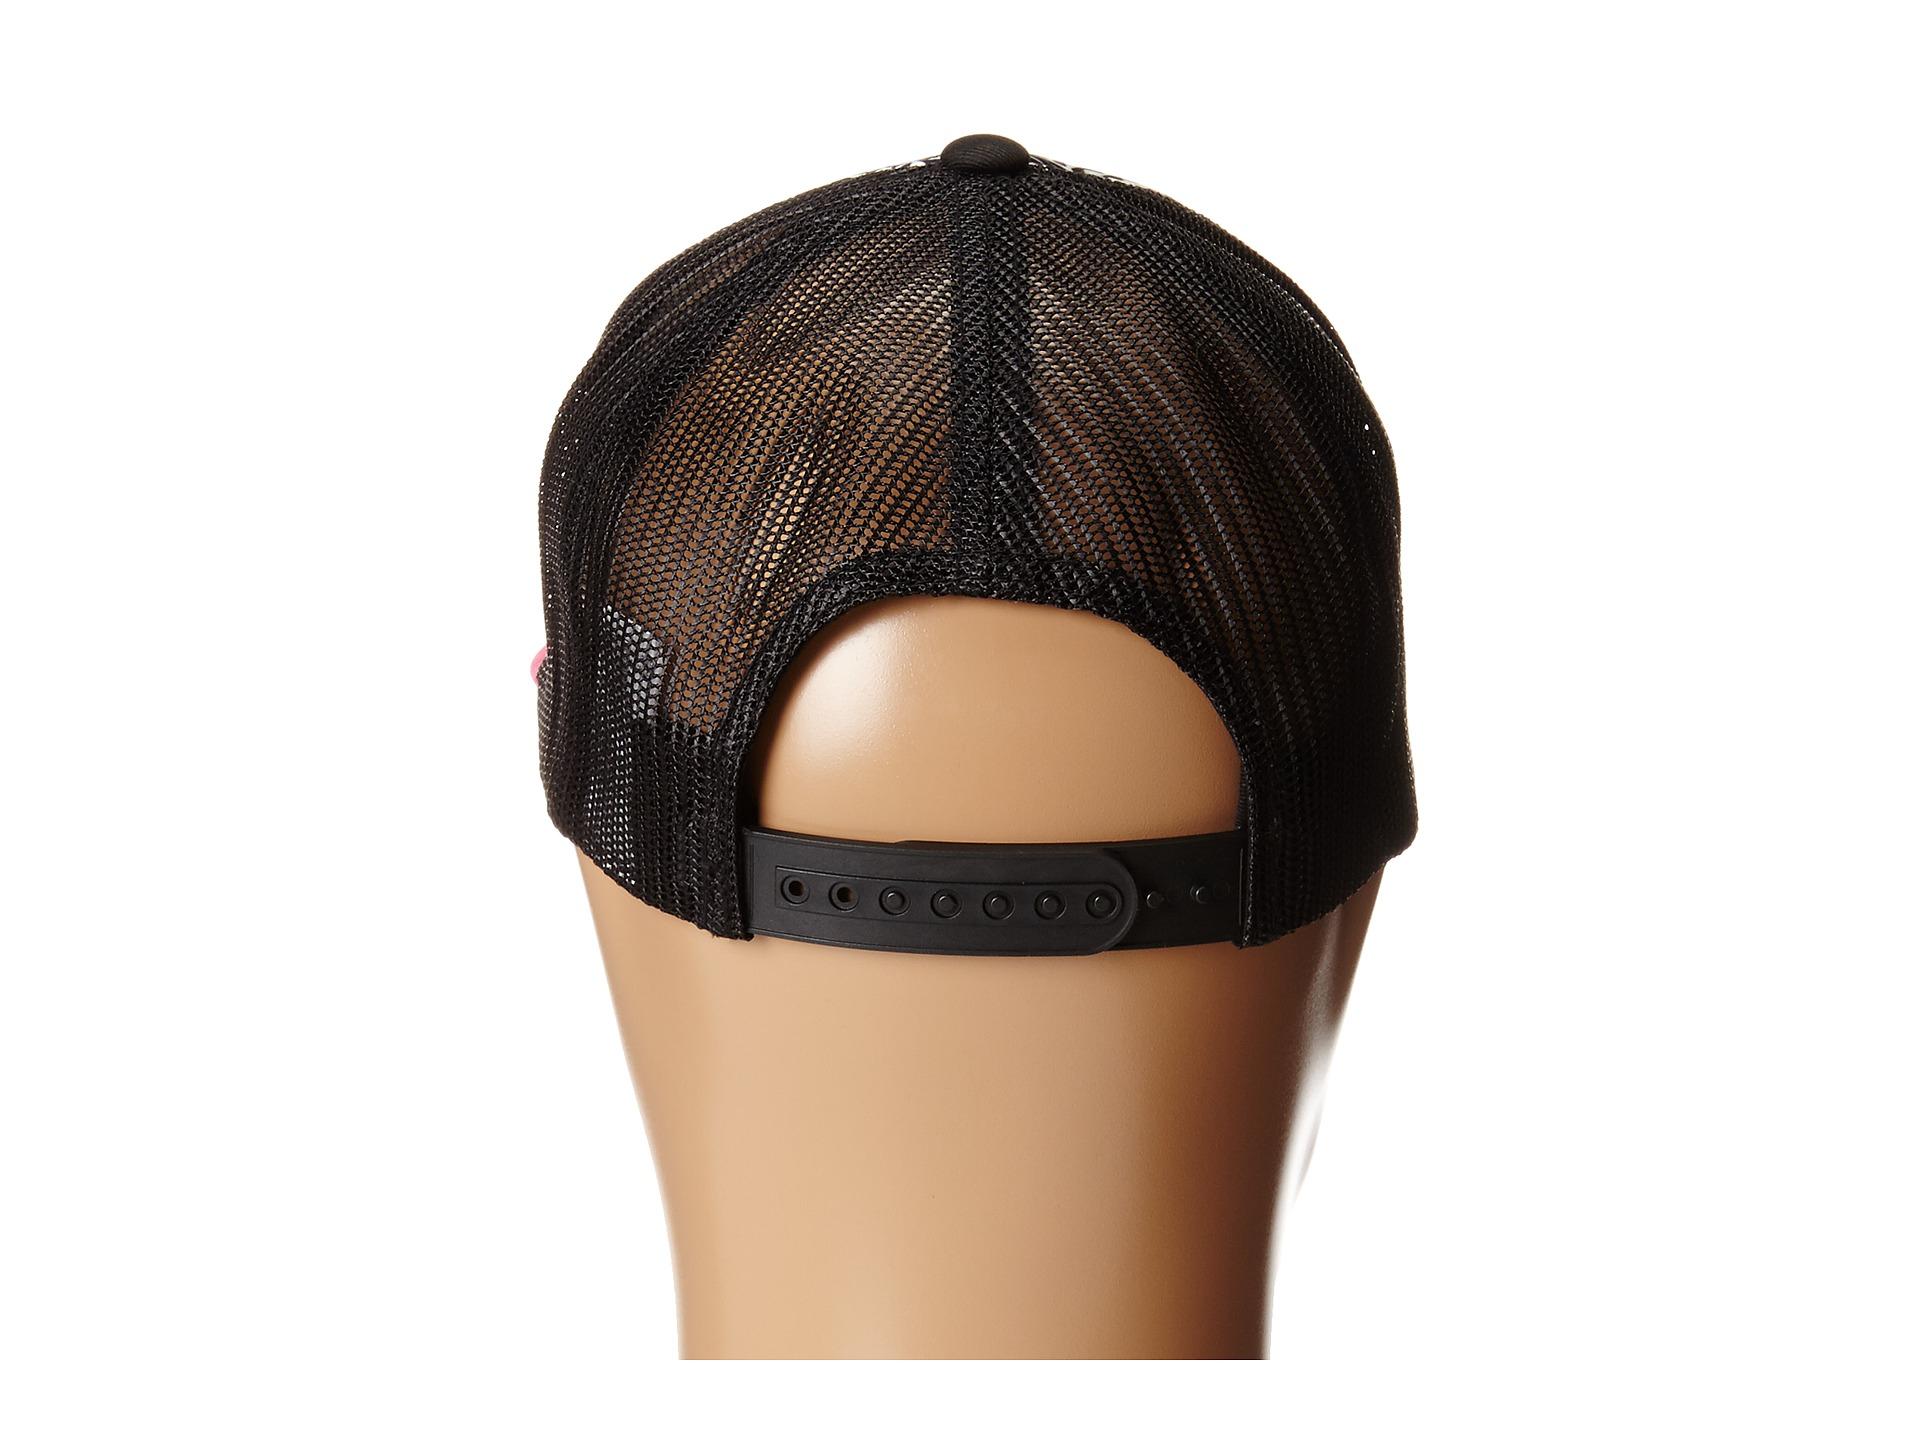 Lyst - Volcom Nacho Trucker Hat in Black 4b45cf8490f7